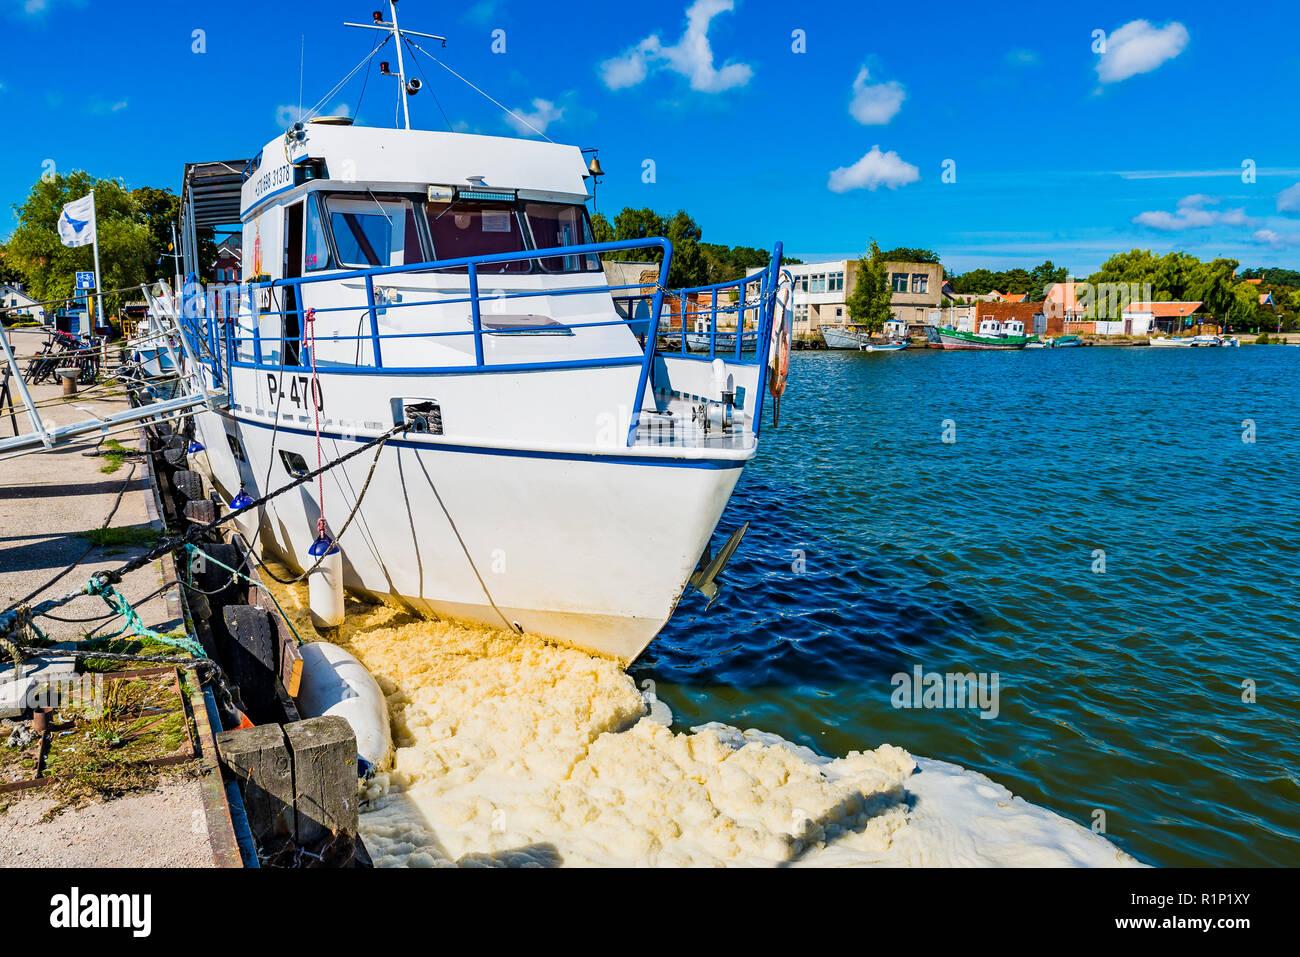 Contaminated foams in the port. Nida, Neringa Municipality, Klaipeda County, Lithuania, Baltic states, Europe. - Stock Image